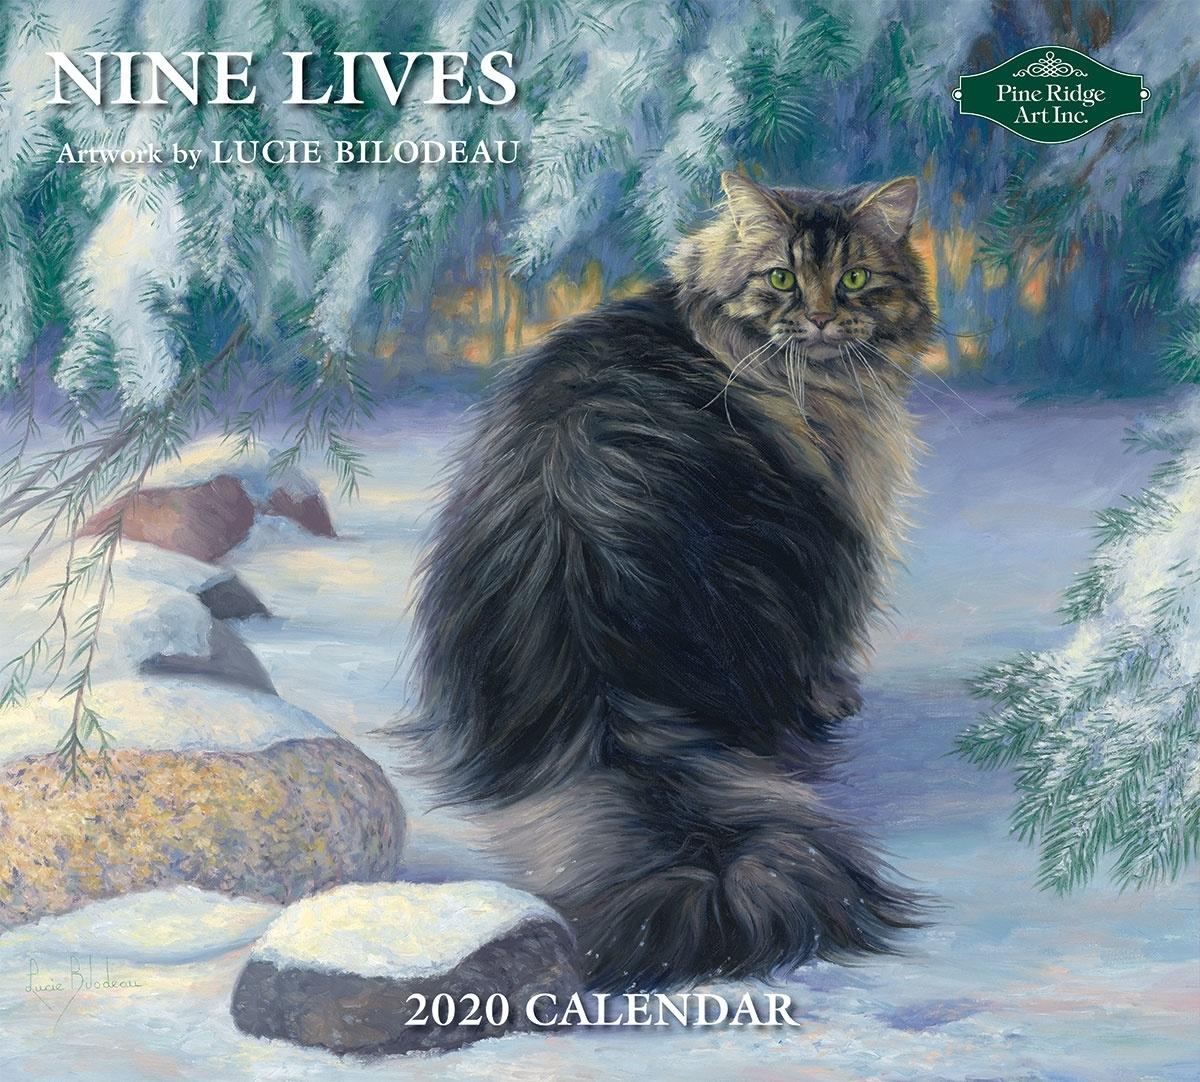 Pine Ridge Art Nine Lives 2020 Wall Calendar